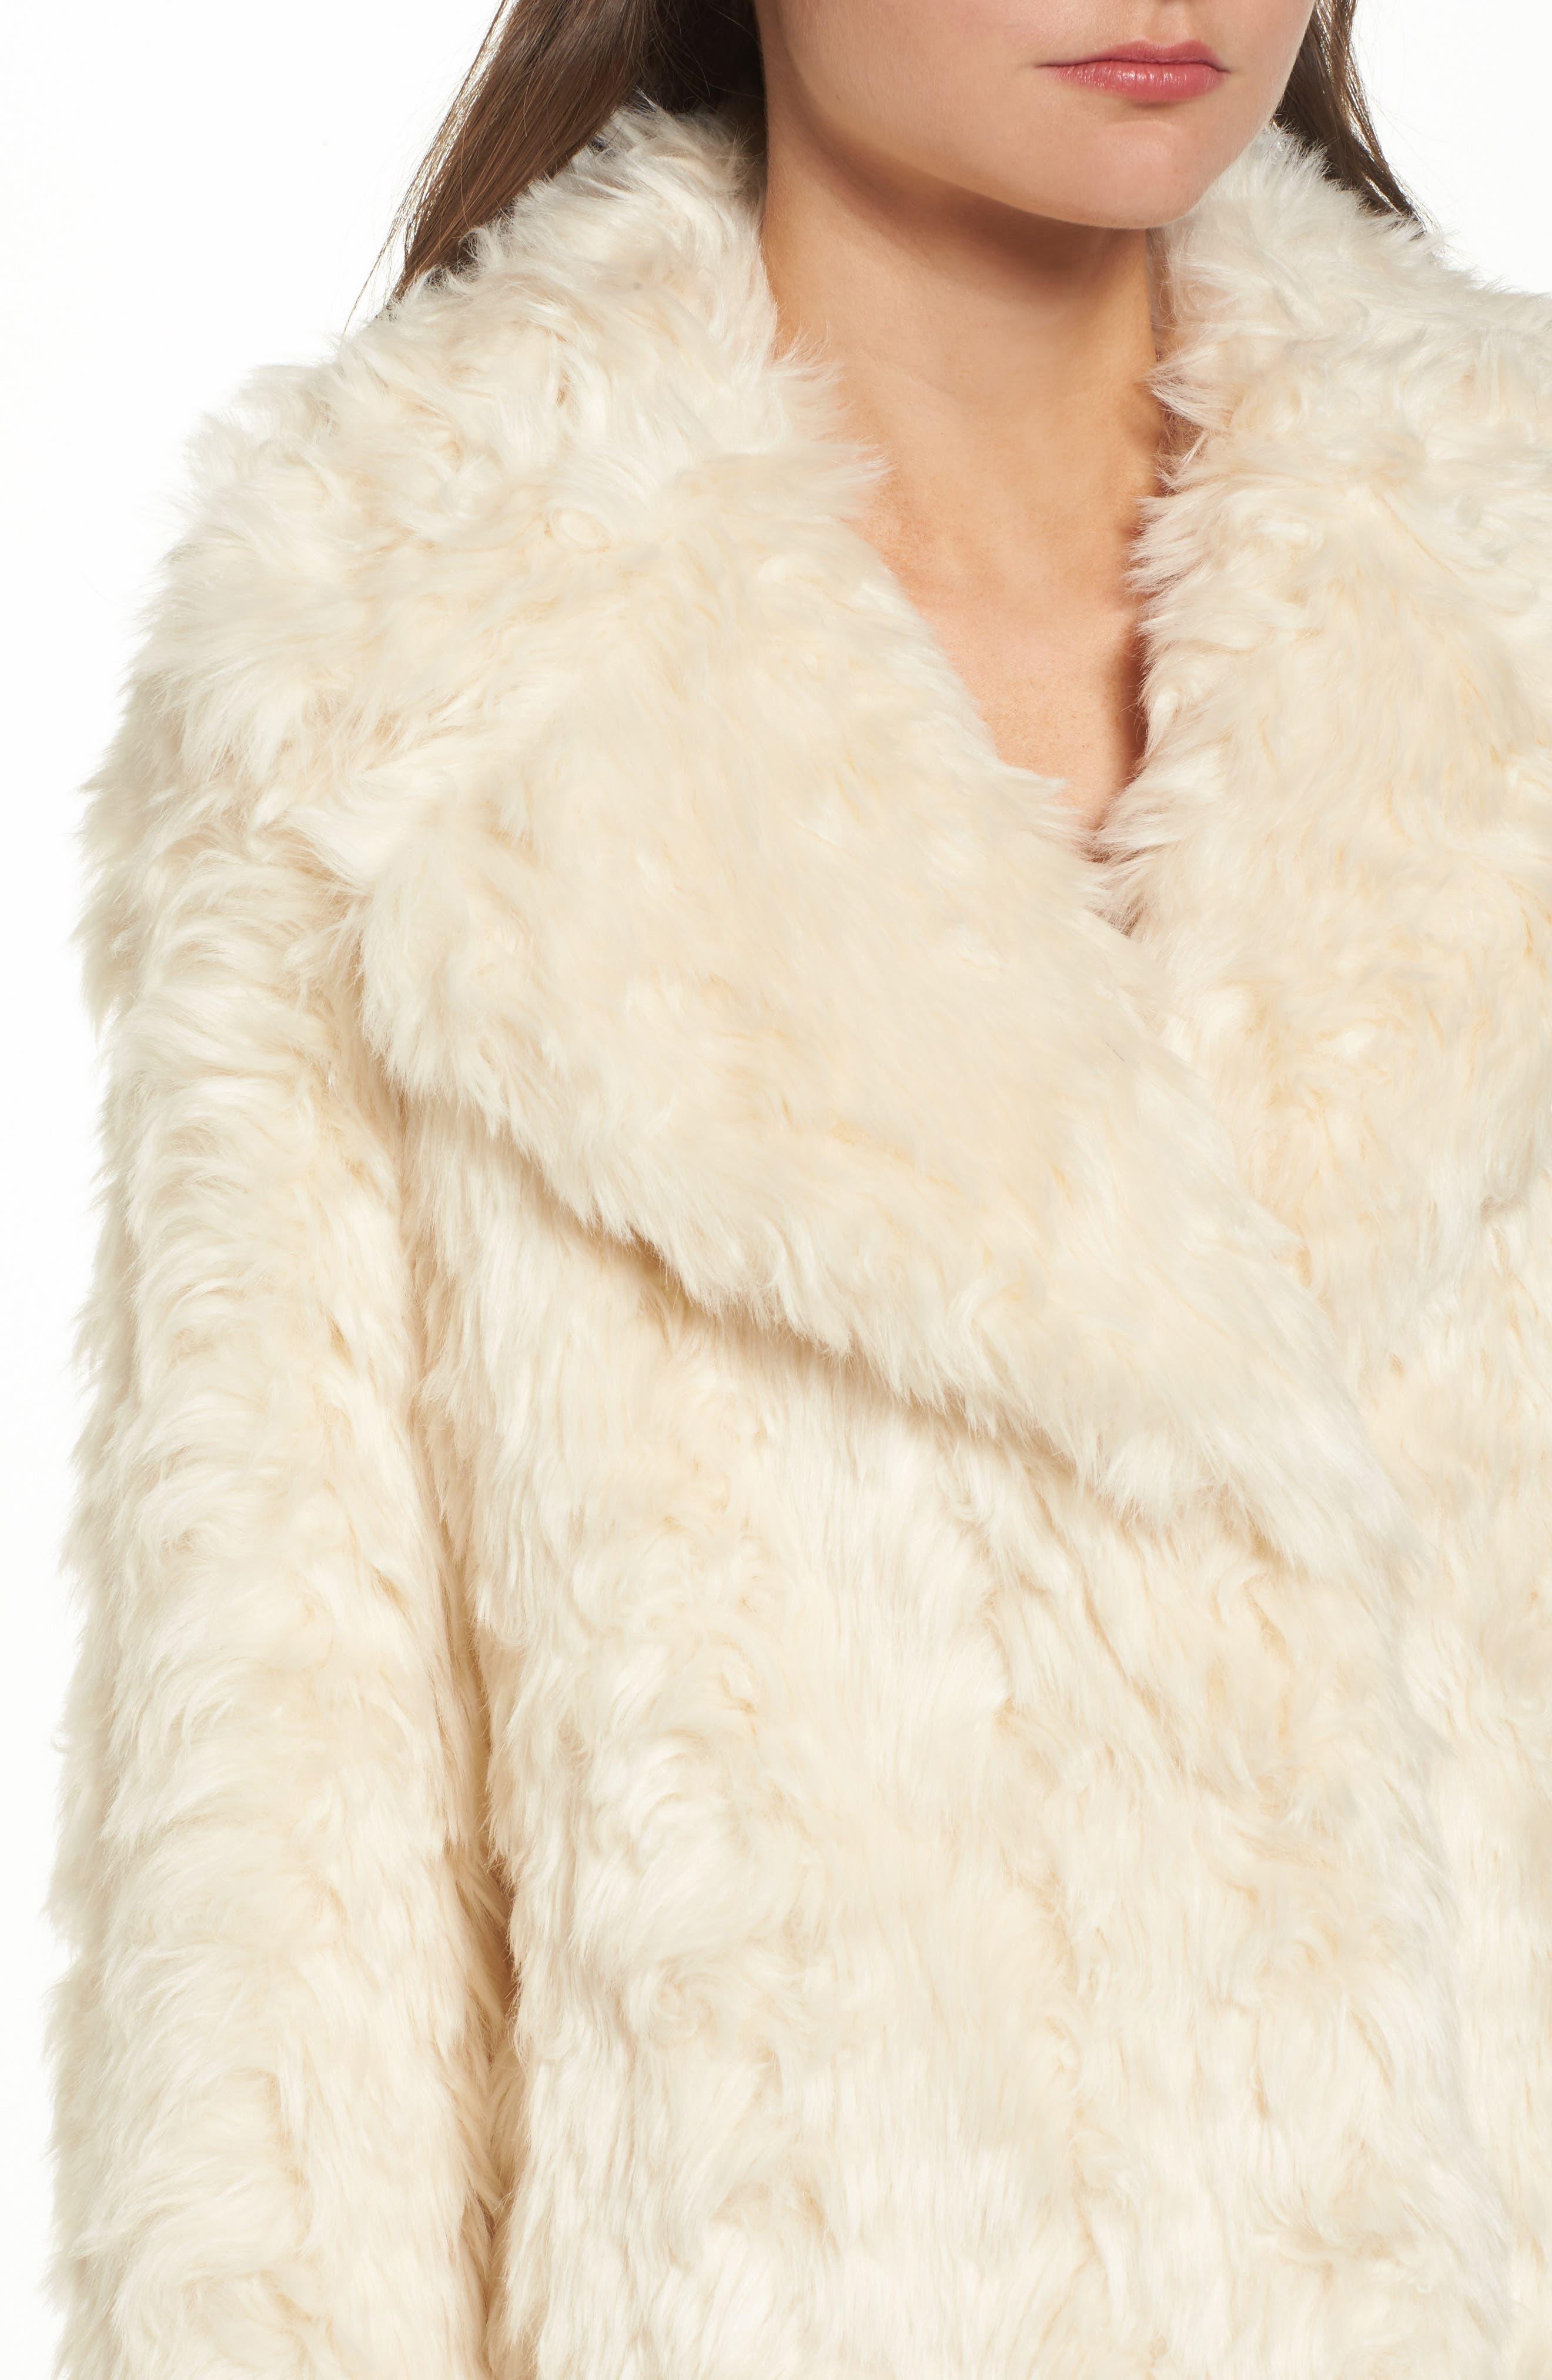 Curly Faux Fur Coat,                             Alternate thumbnail 4, color,                             Ivory